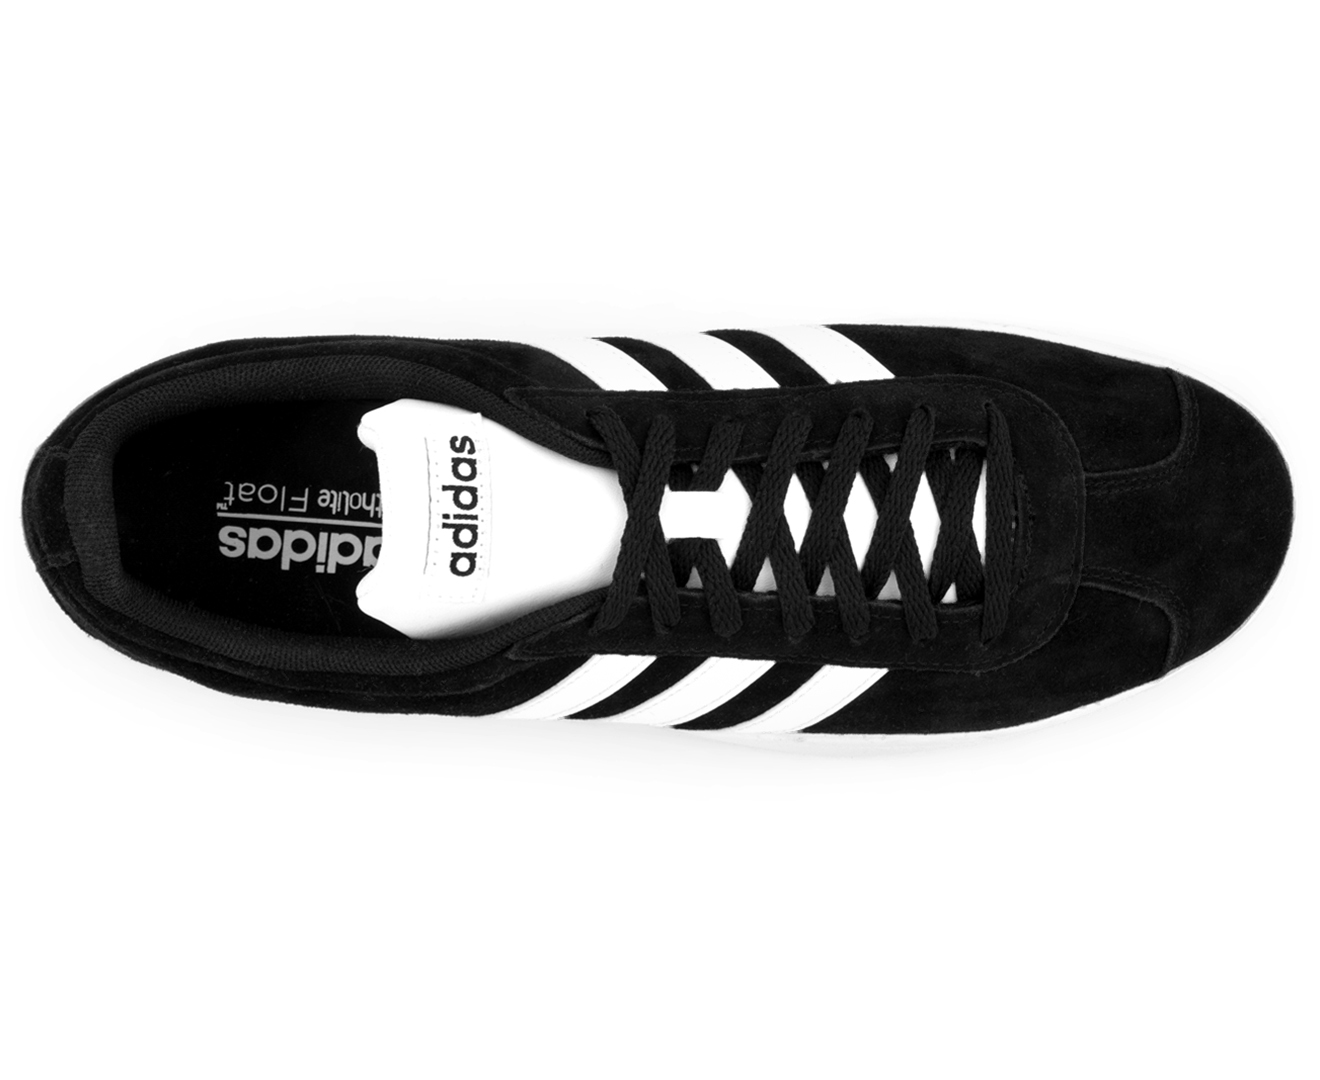 Details about Adidas Men's VL Court 2.0 Sneakers Core BlackWhiteWhite